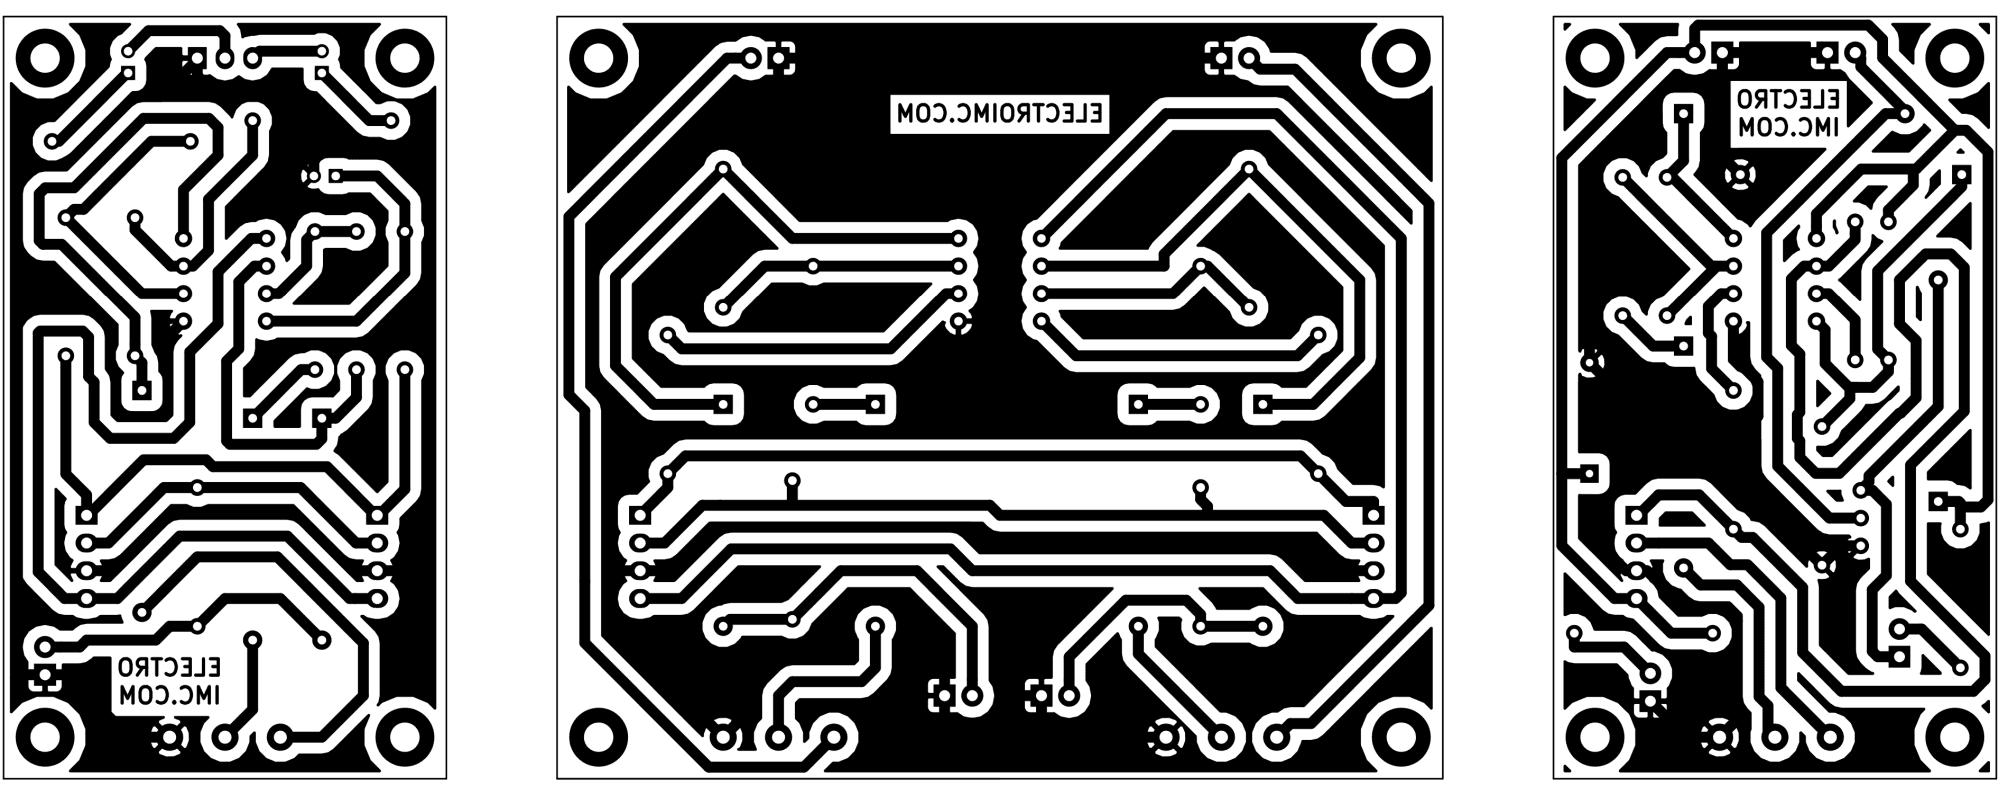 Circuito impreso para la mesa de mezcla audio modular